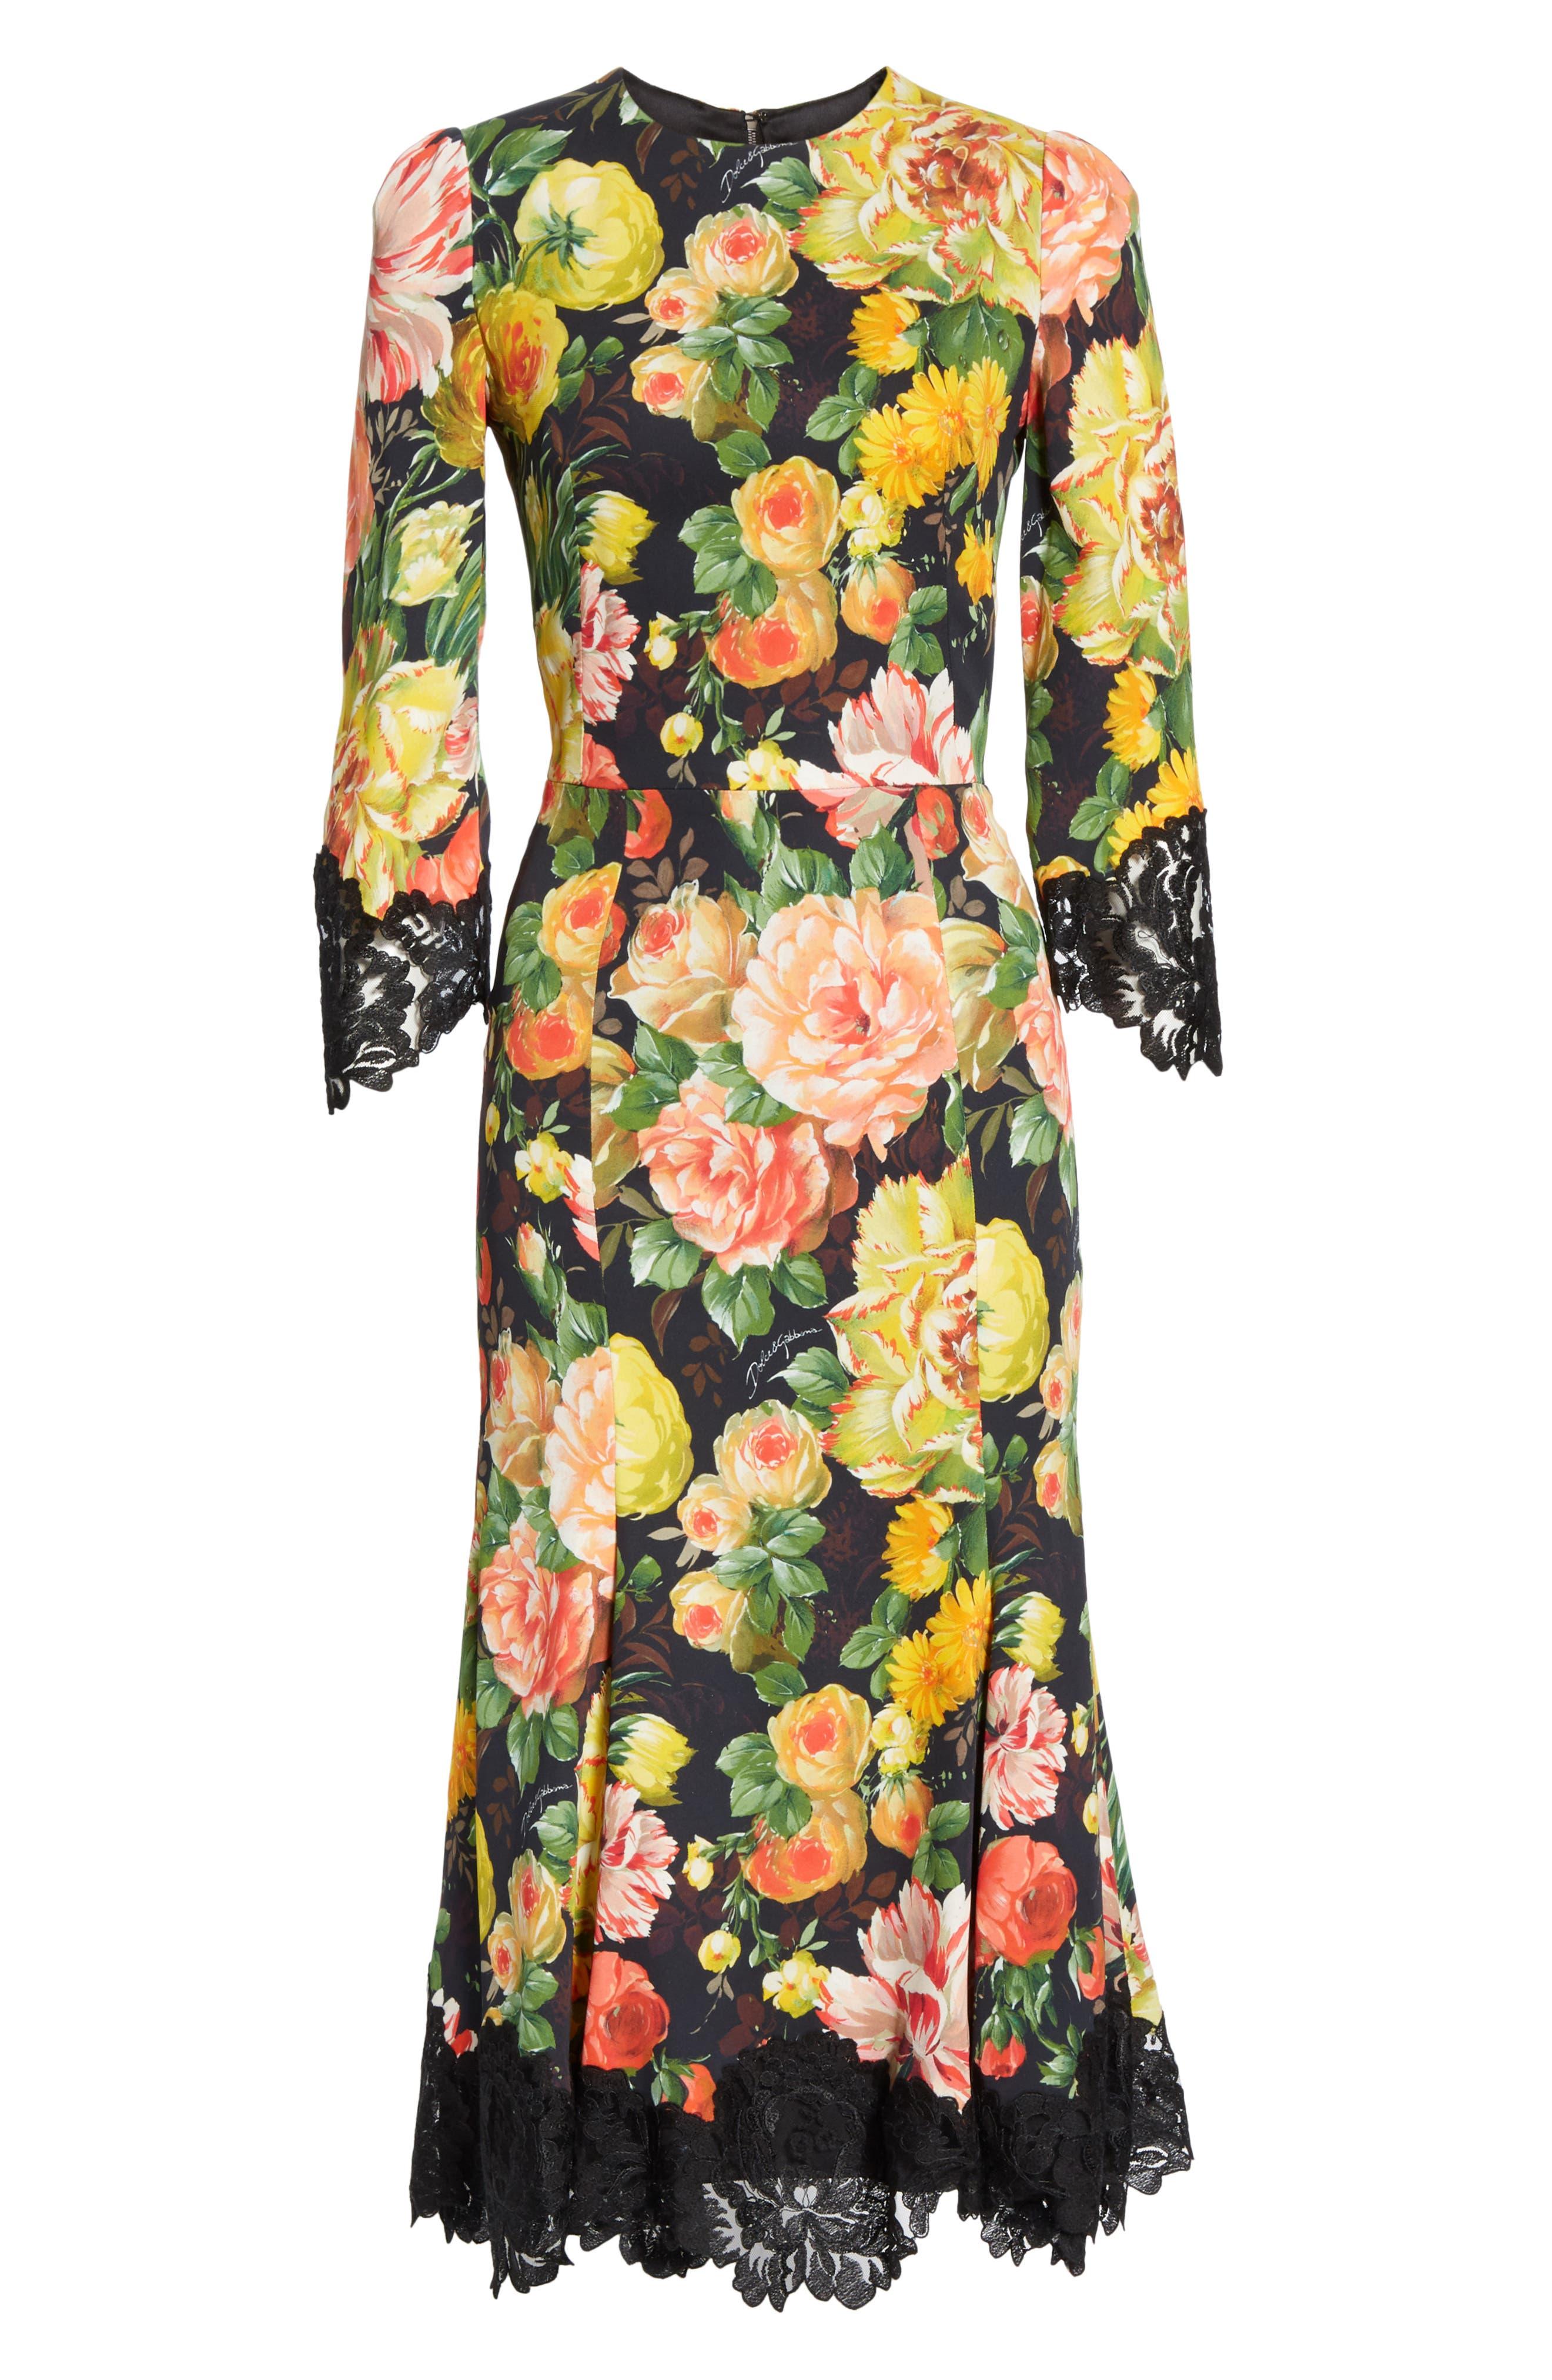 Dolce & gabbana Lace Trim Floral Print Cady Dress, US / 46 IT - Black